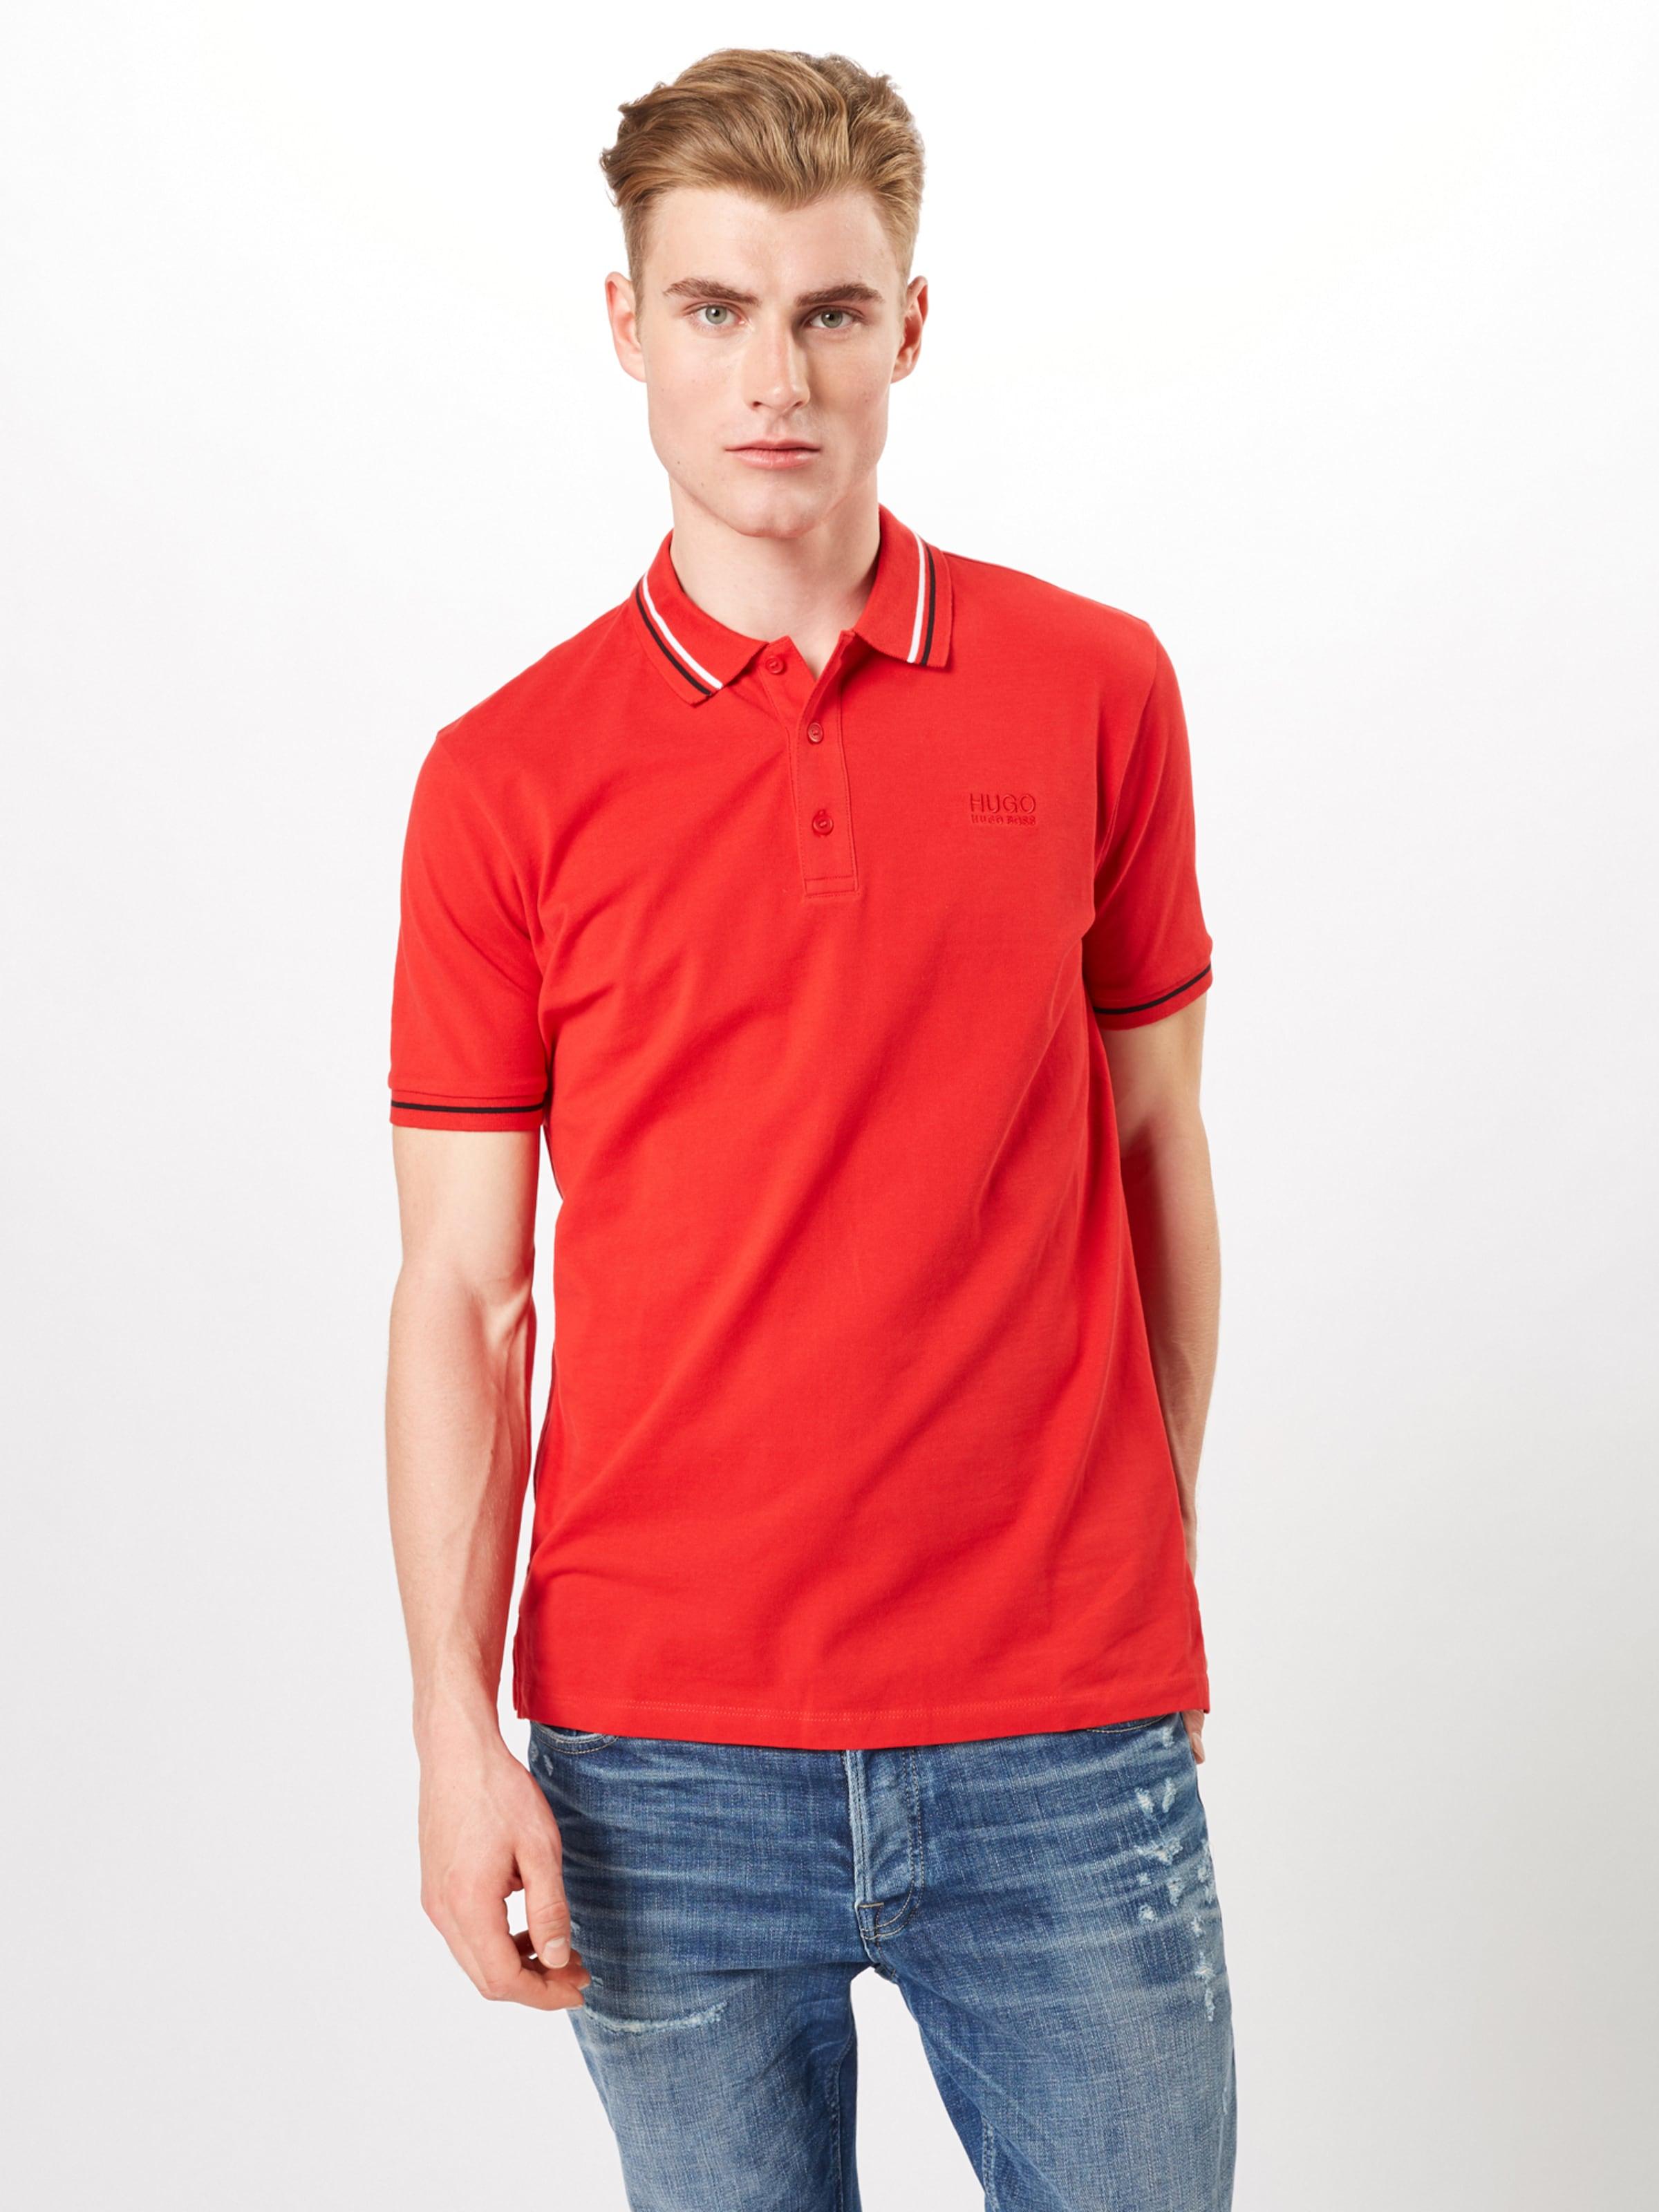 Poloshirt Hugo In Rot 'daruso u1' b7yfI6gvY